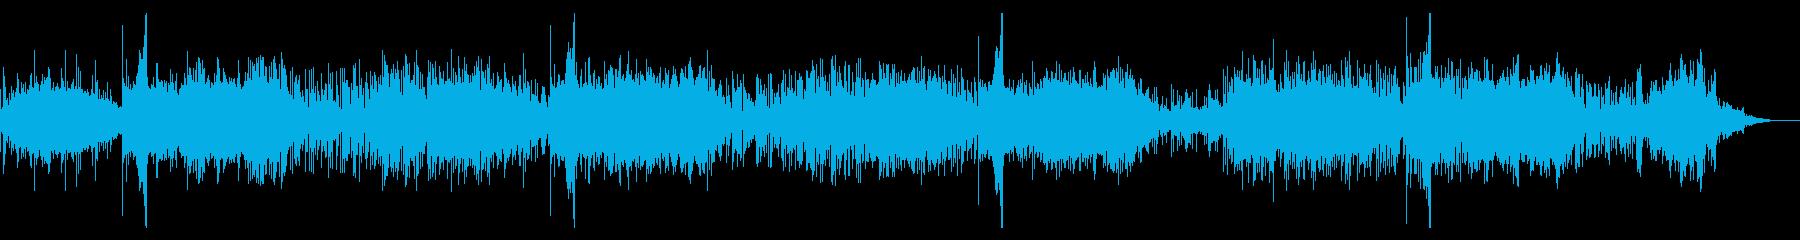 SF風のアンビエントIDMの再生済みの波形